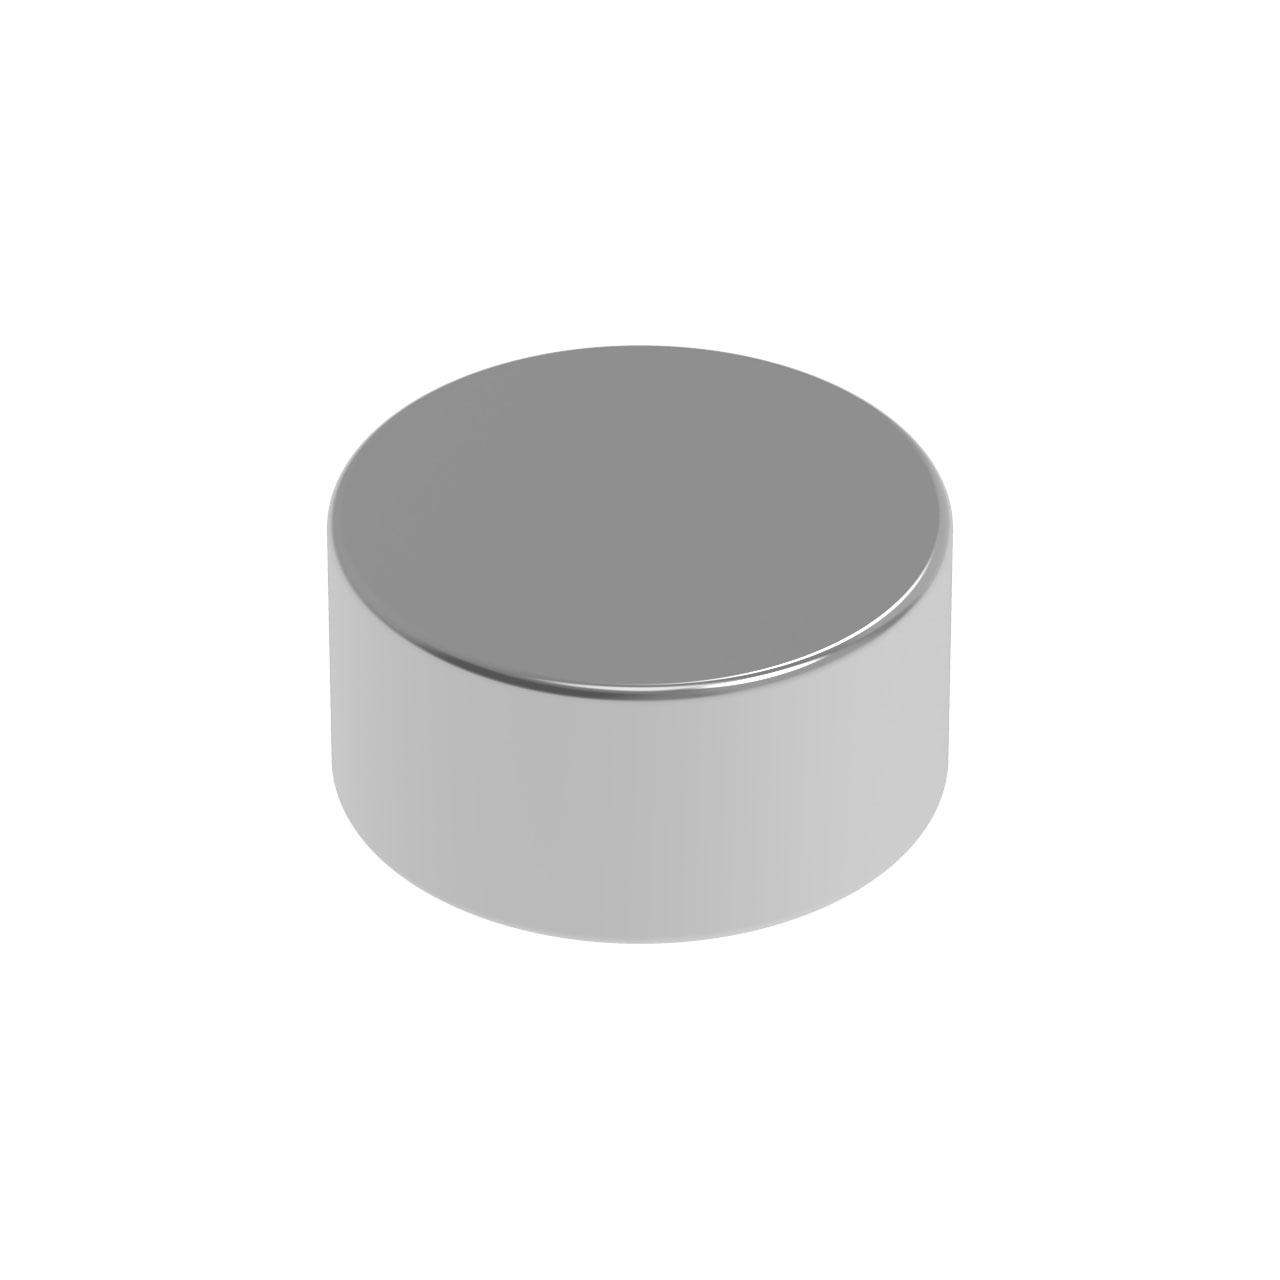 HIQPARTS(ハイキューパーツ) ネオジム磁石 N52 丸形 直径4mm x 高さ2mm(10個入) [MGN4020] 4582370705977